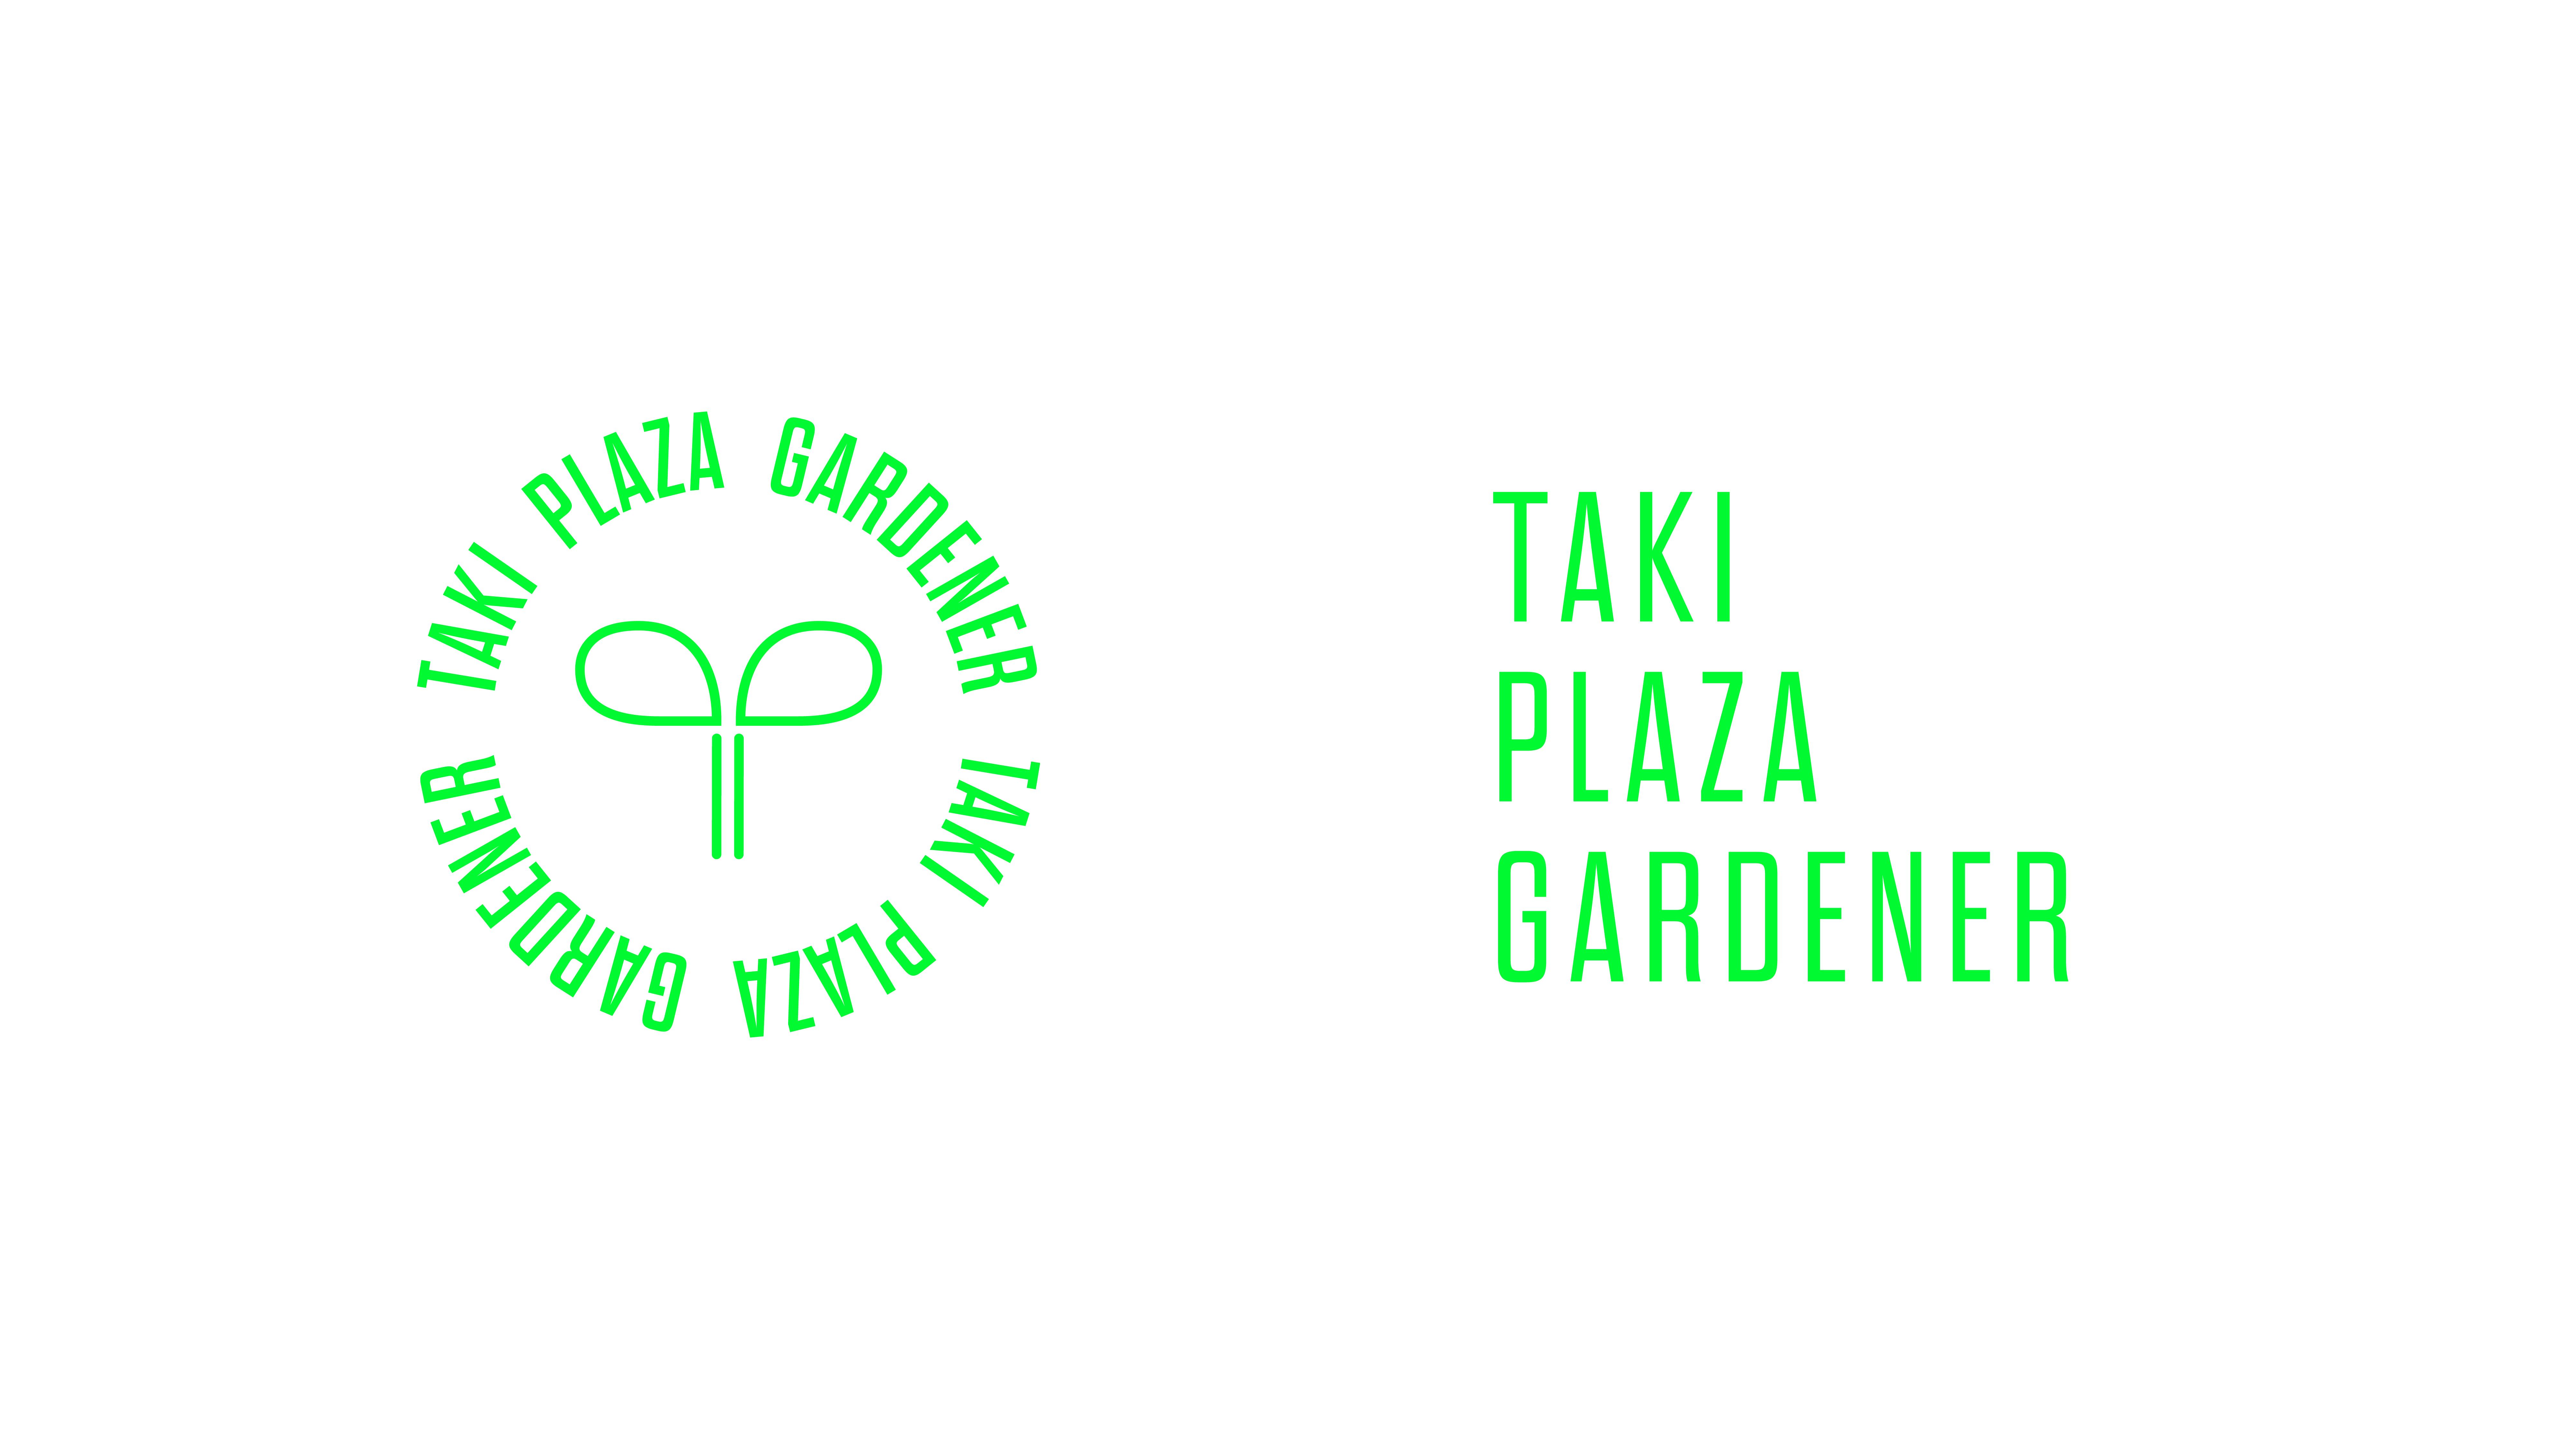 Taki Plaza Gardenerについて知ってもらいたい   About Taki Plaza Gardener